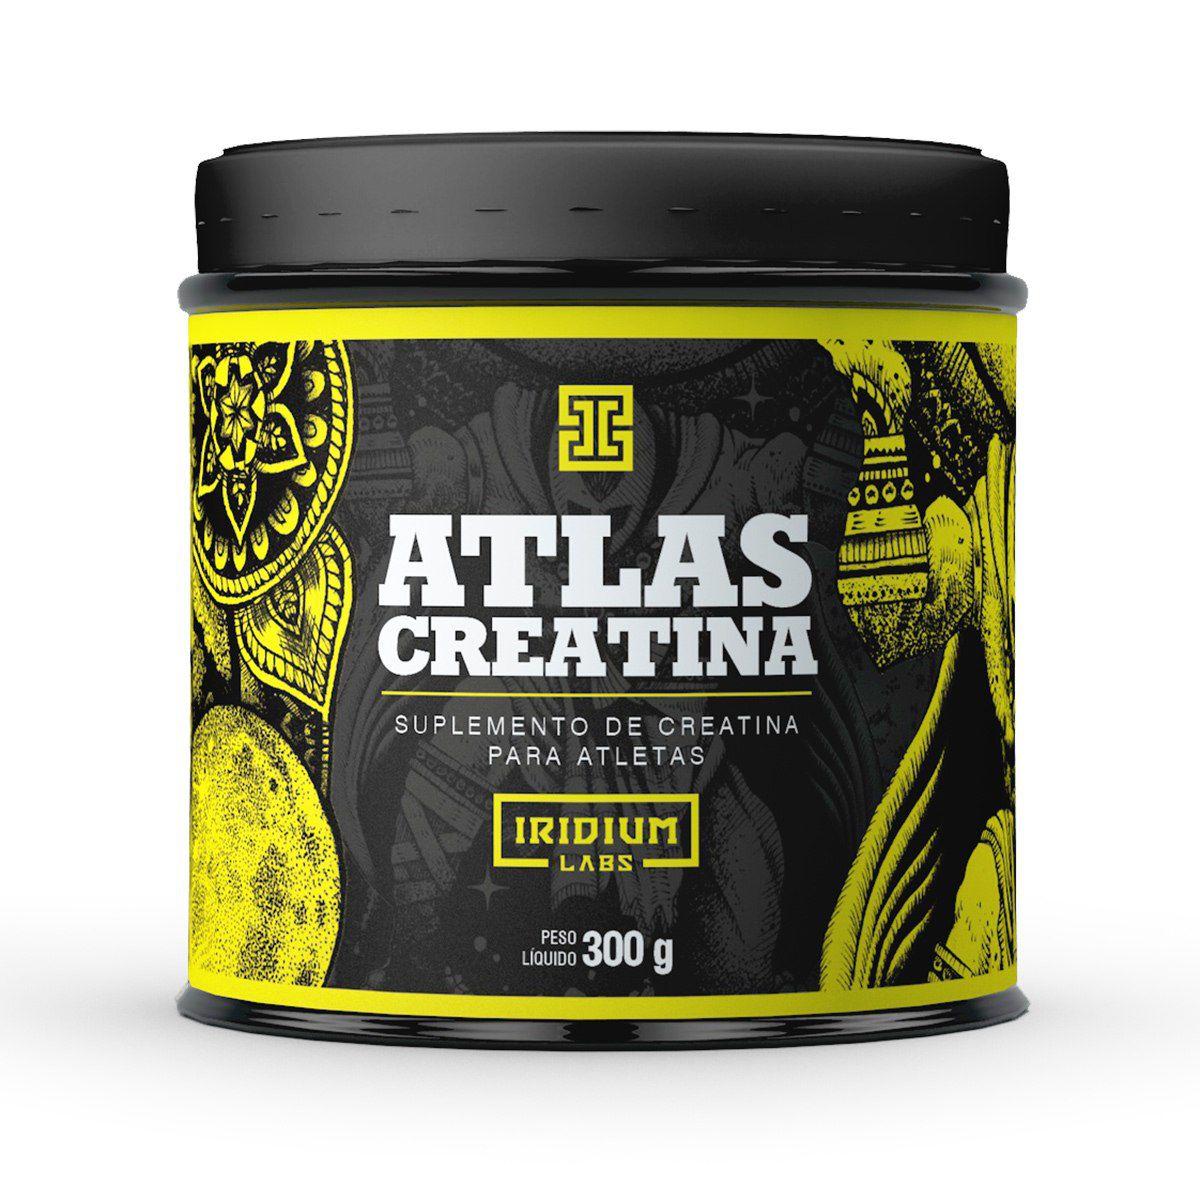 Creatina Atlas Iridium Labs - 300g